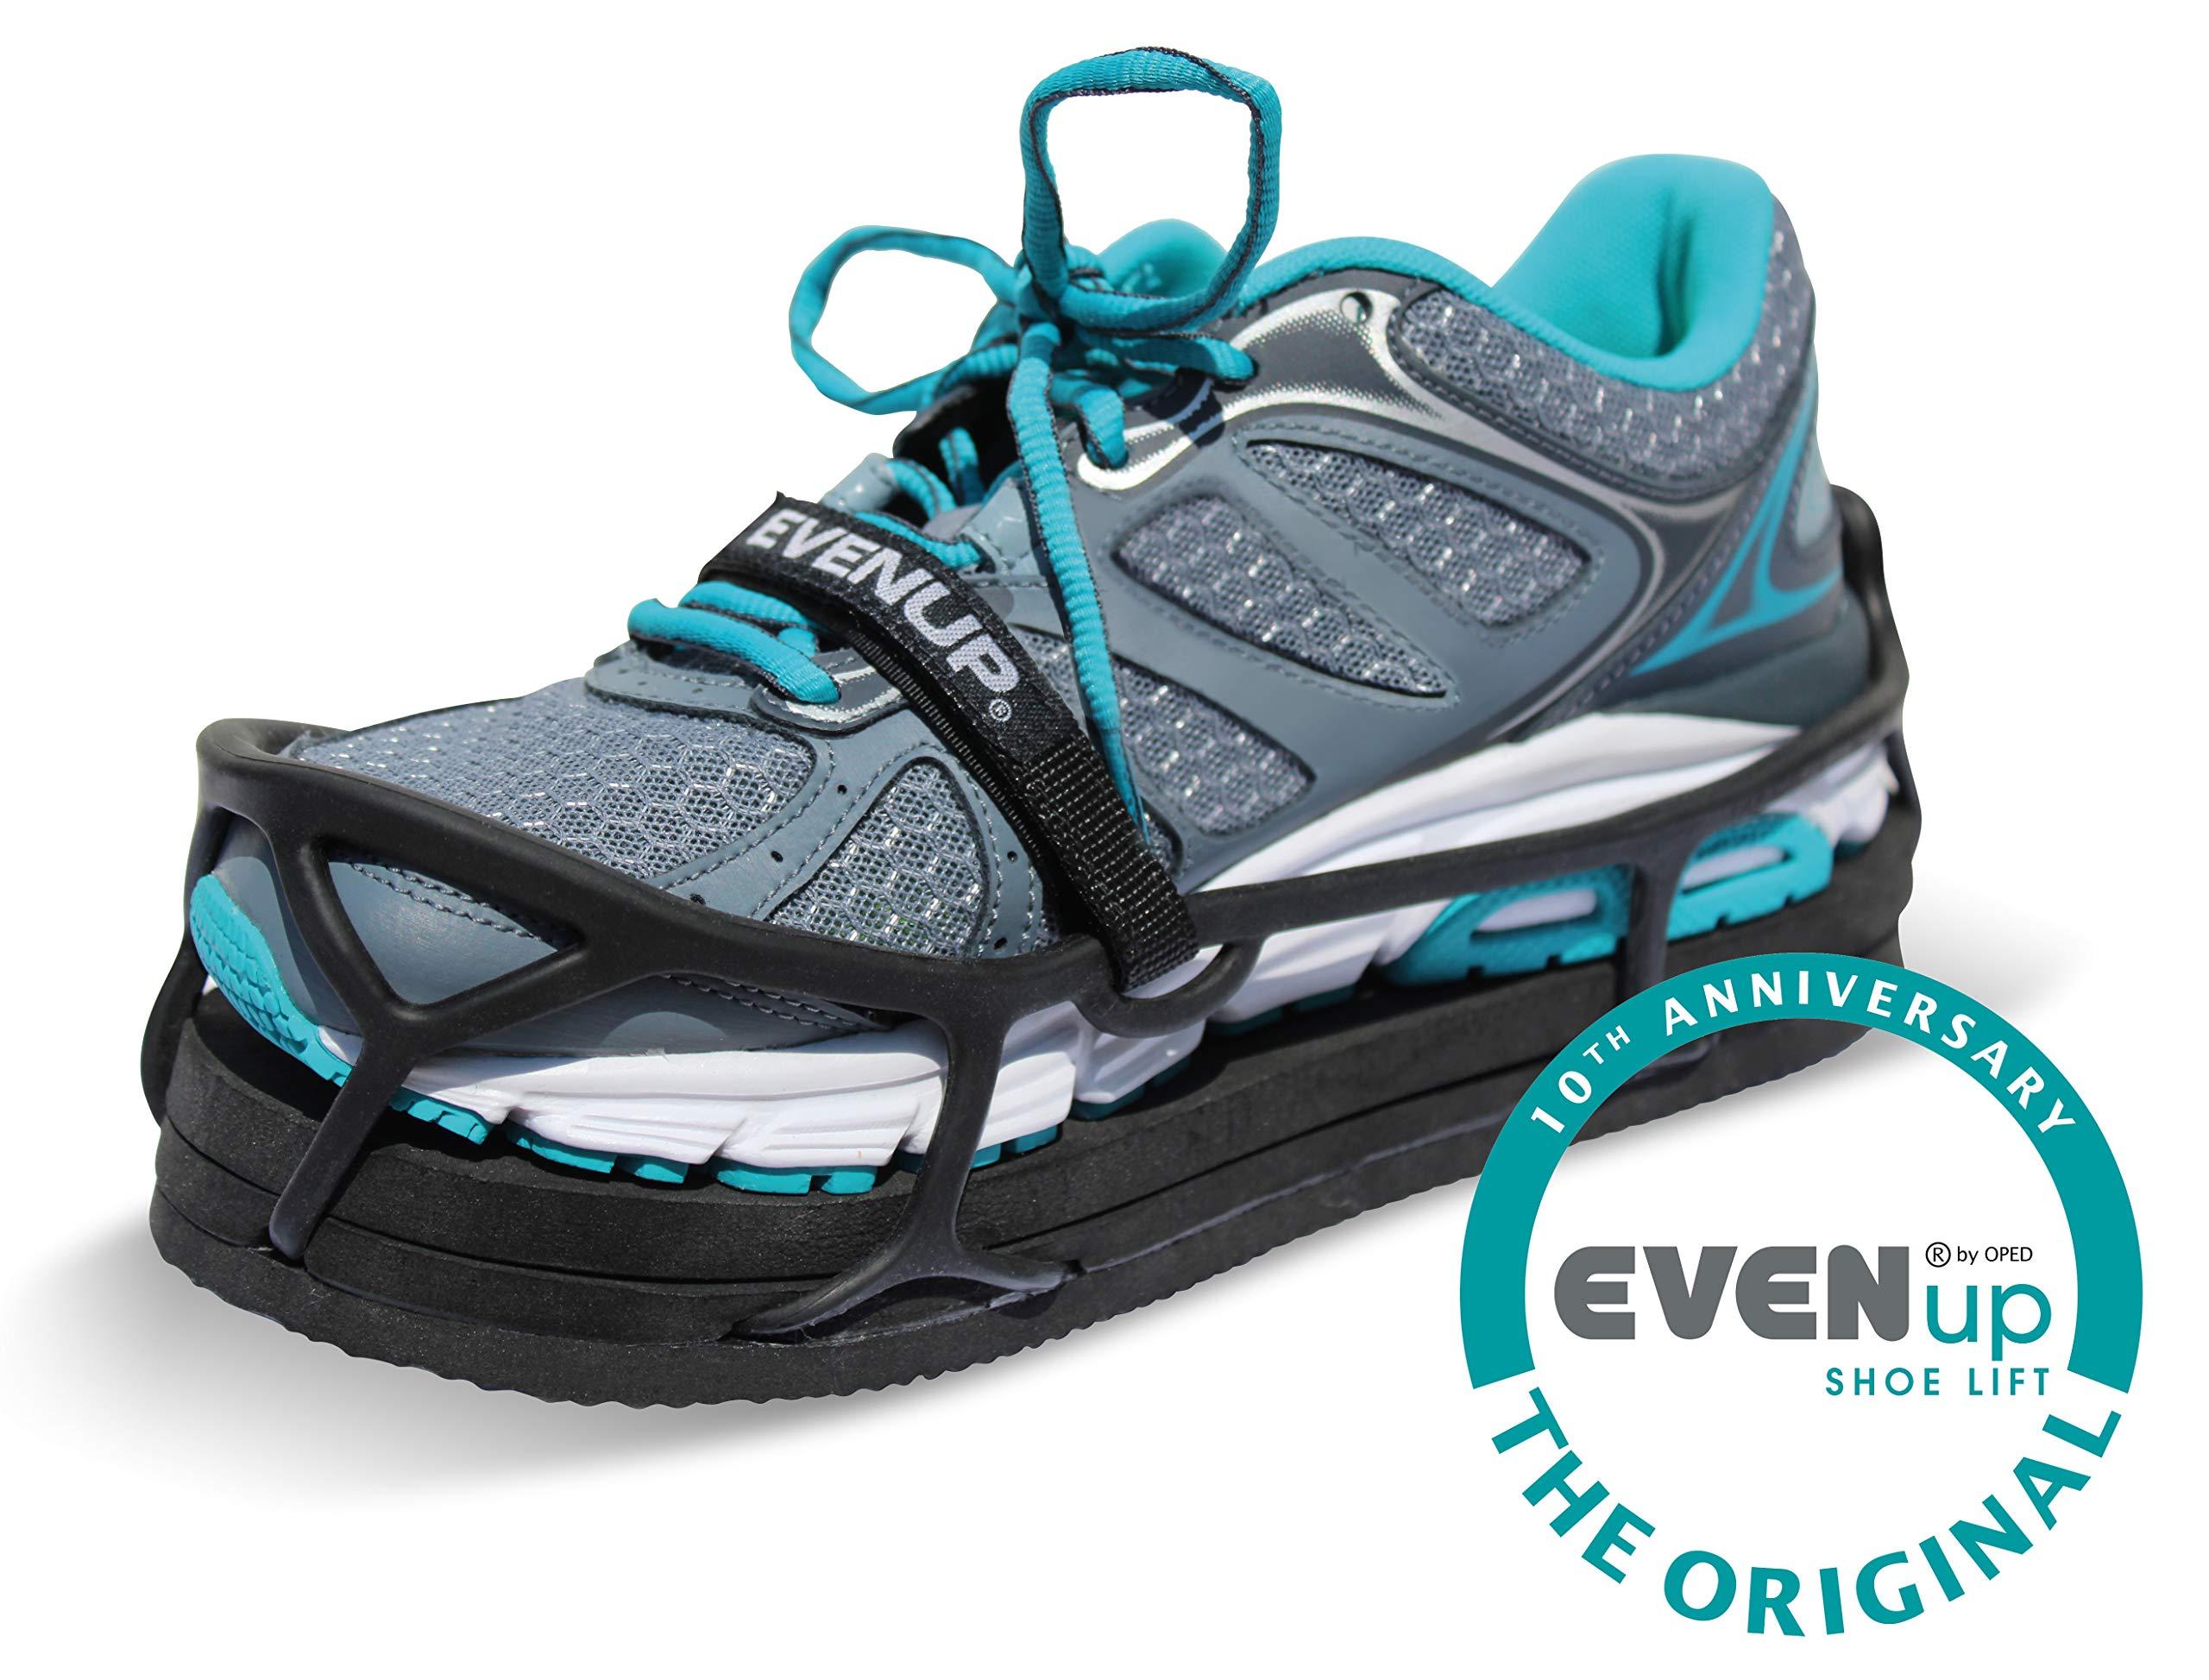 Original EVENup ® Shoe Balancer/Leveler - Equalize Limb Length and Reduce Body Strain While Walking (XSmall)